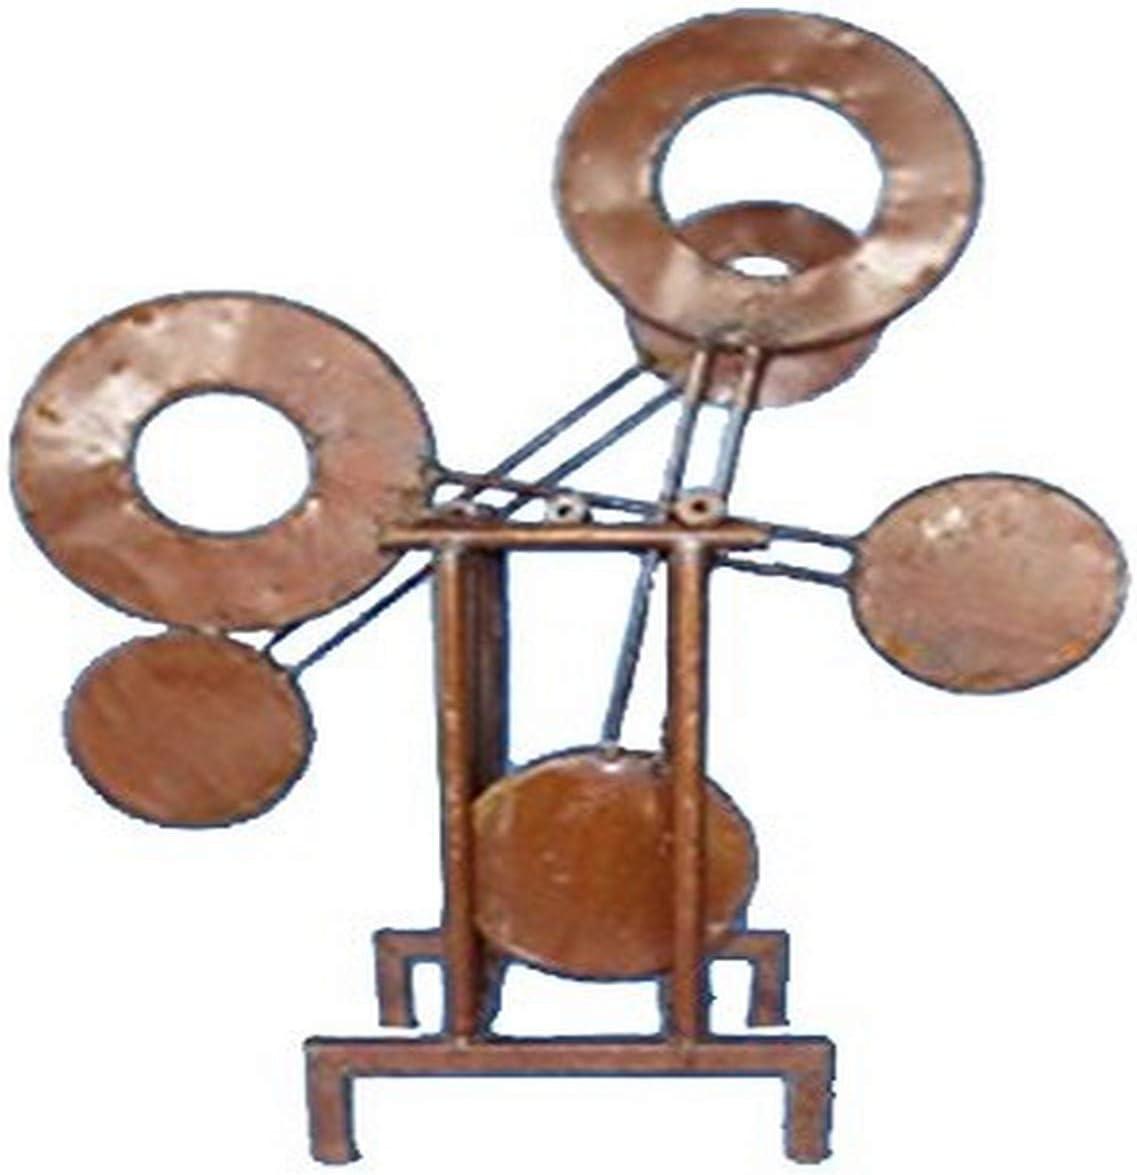 Rustic Arrow Pendulum Garden Art